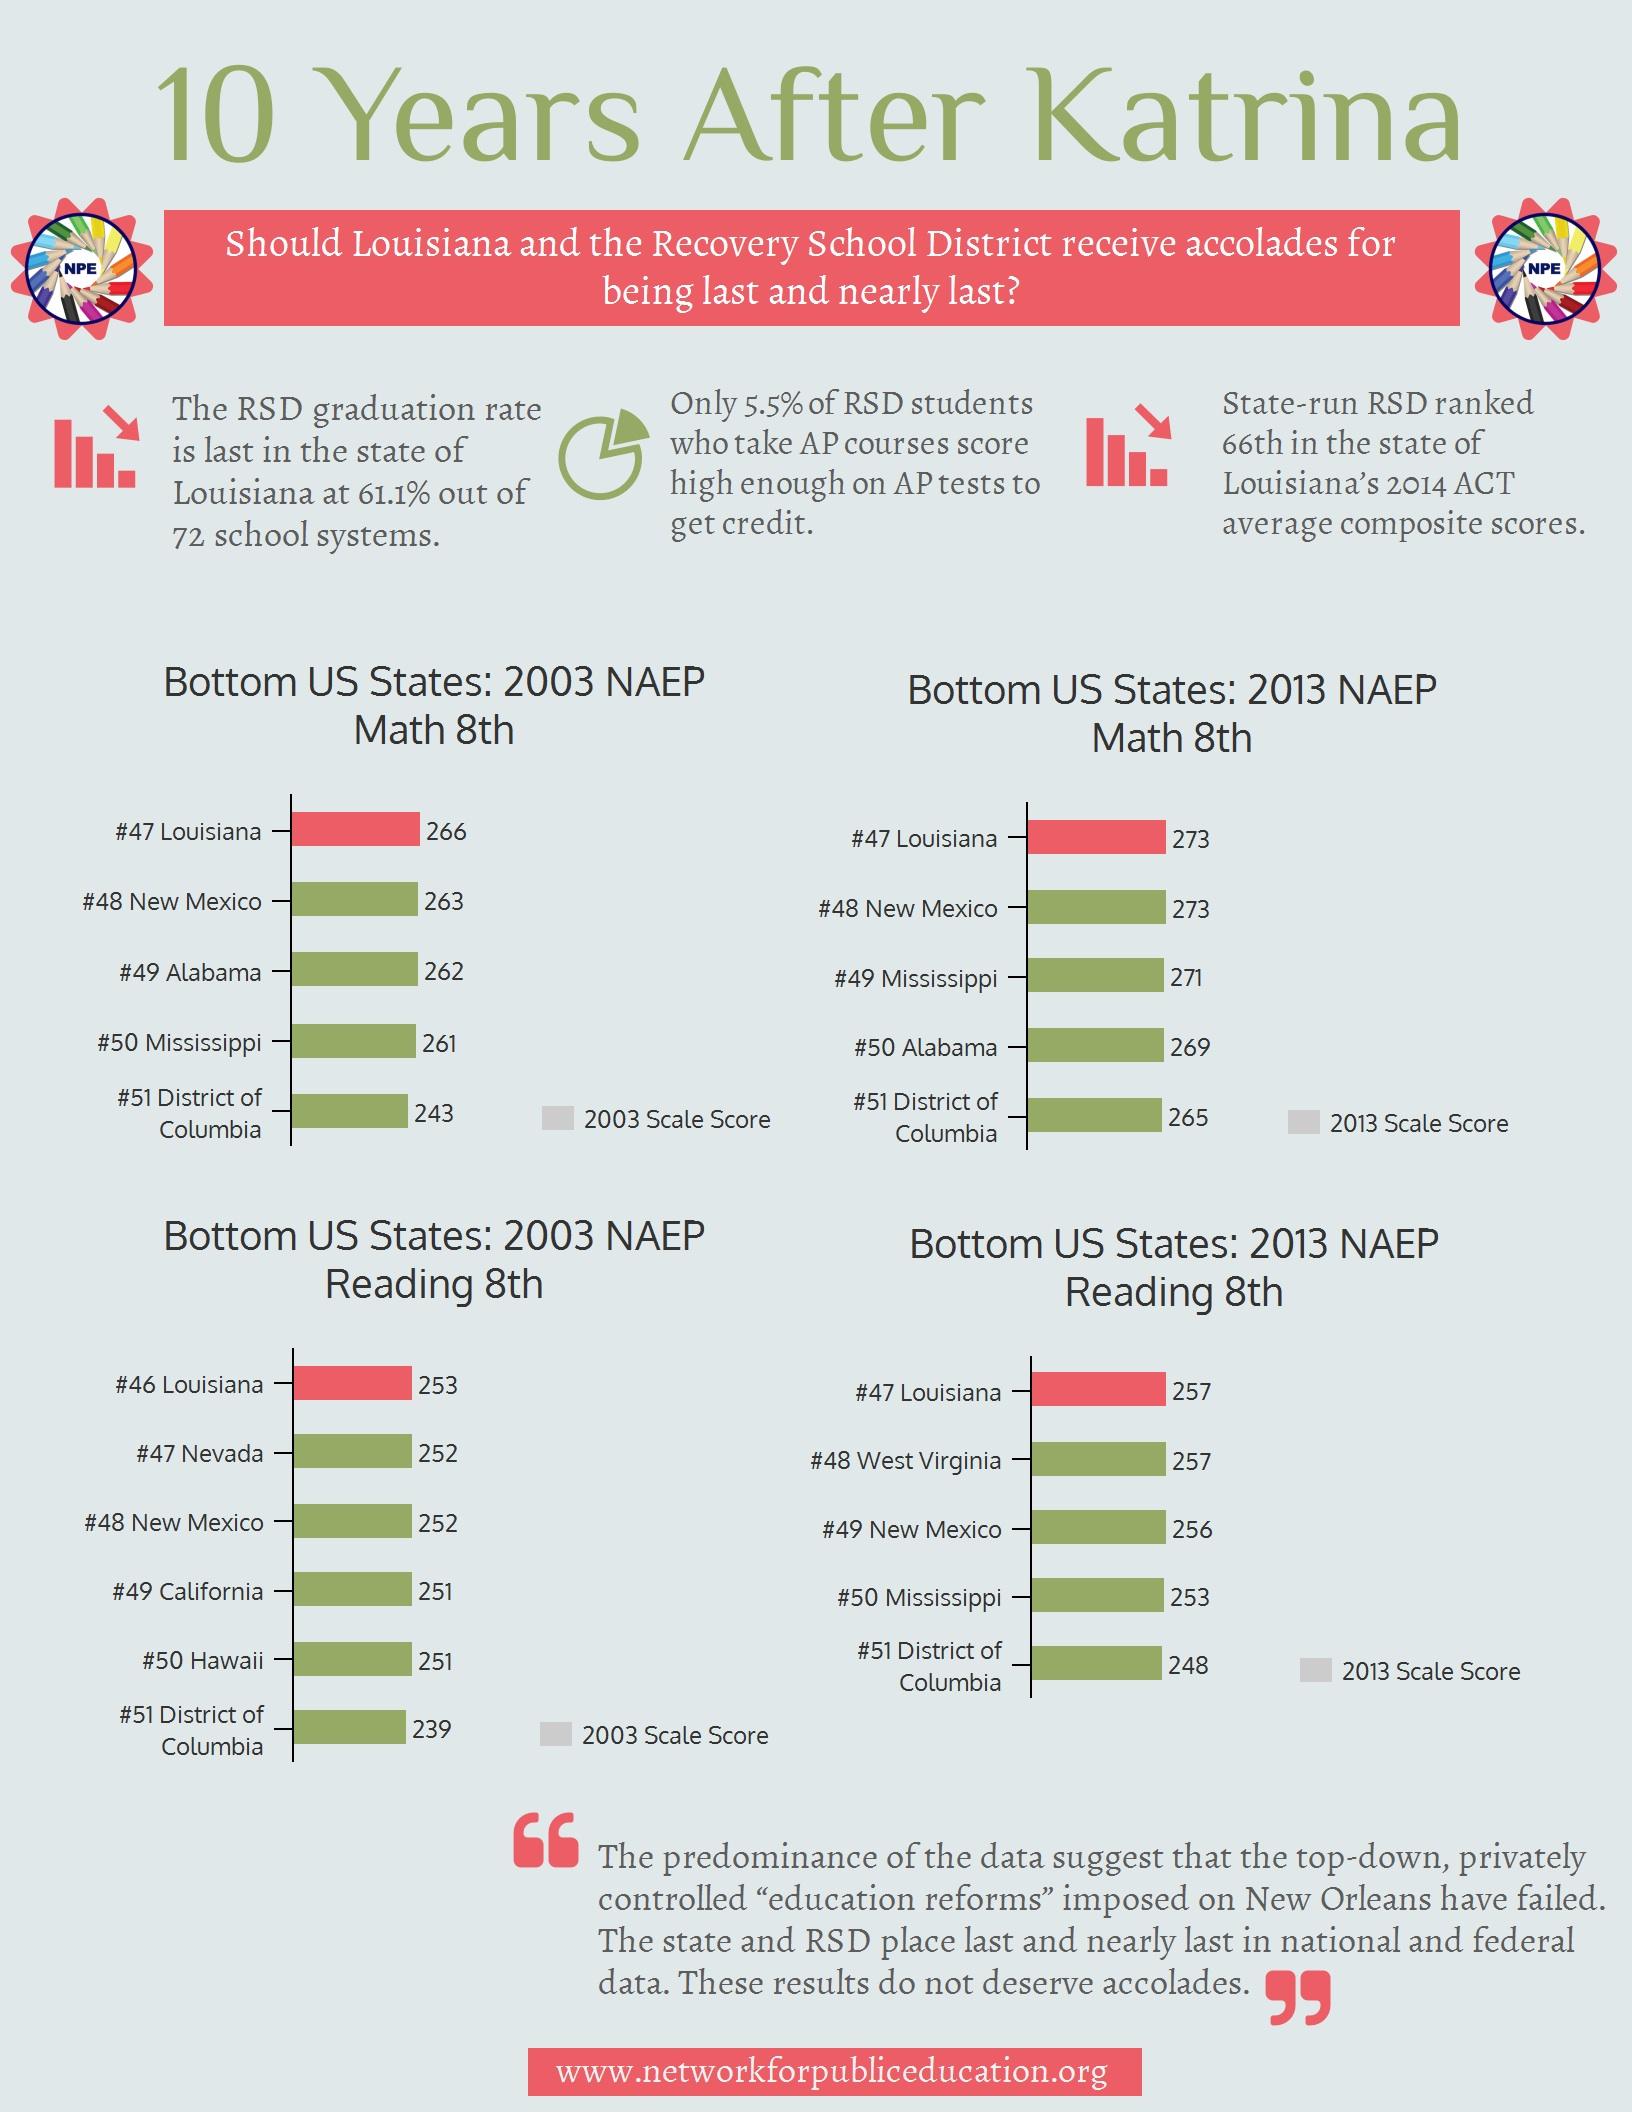 Julian's Katrina Infographic